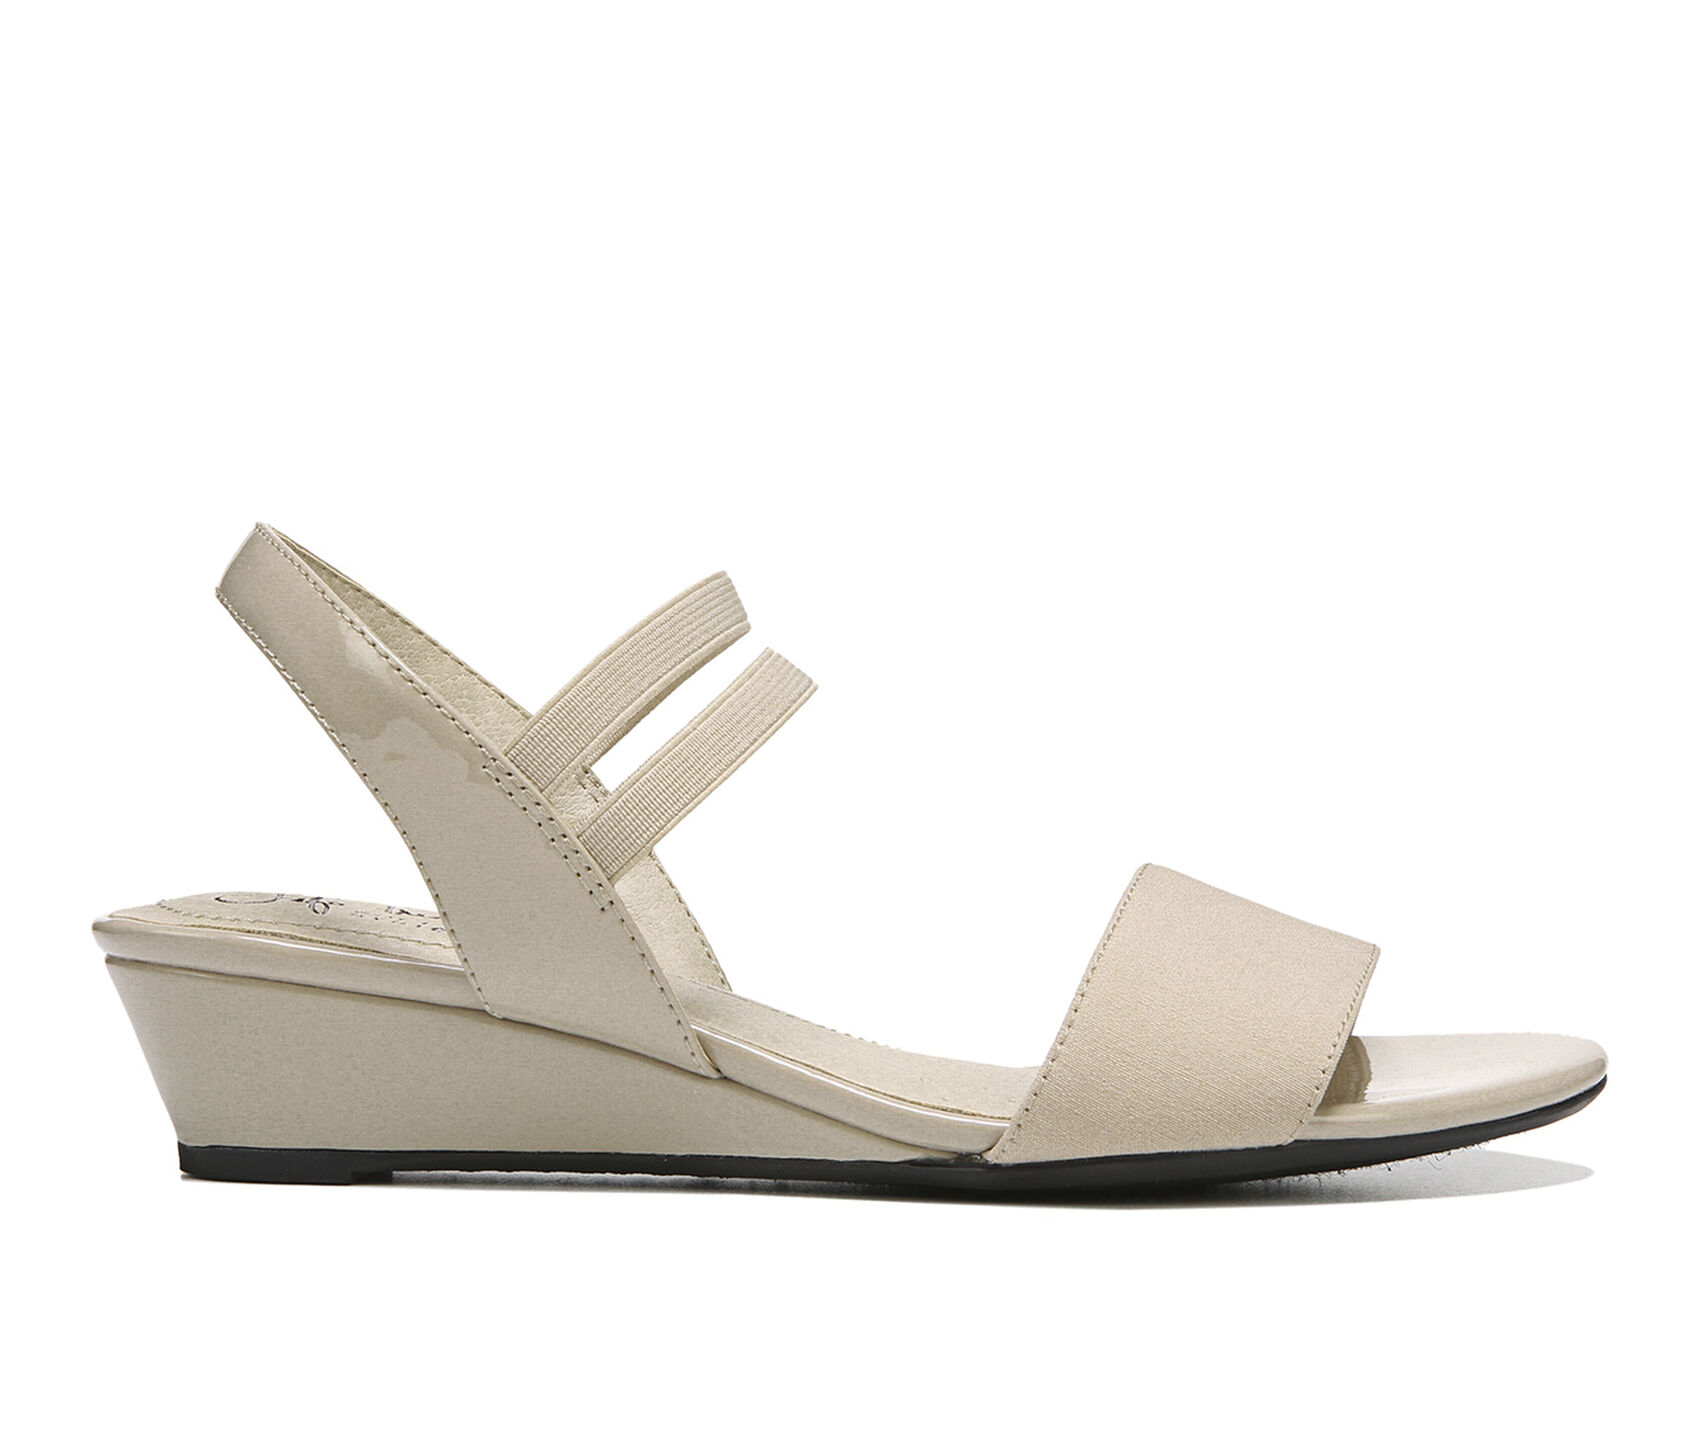 e5b9b83b54b Women's LifeStride Yolo Wedge Sandals | Shoe Carnival